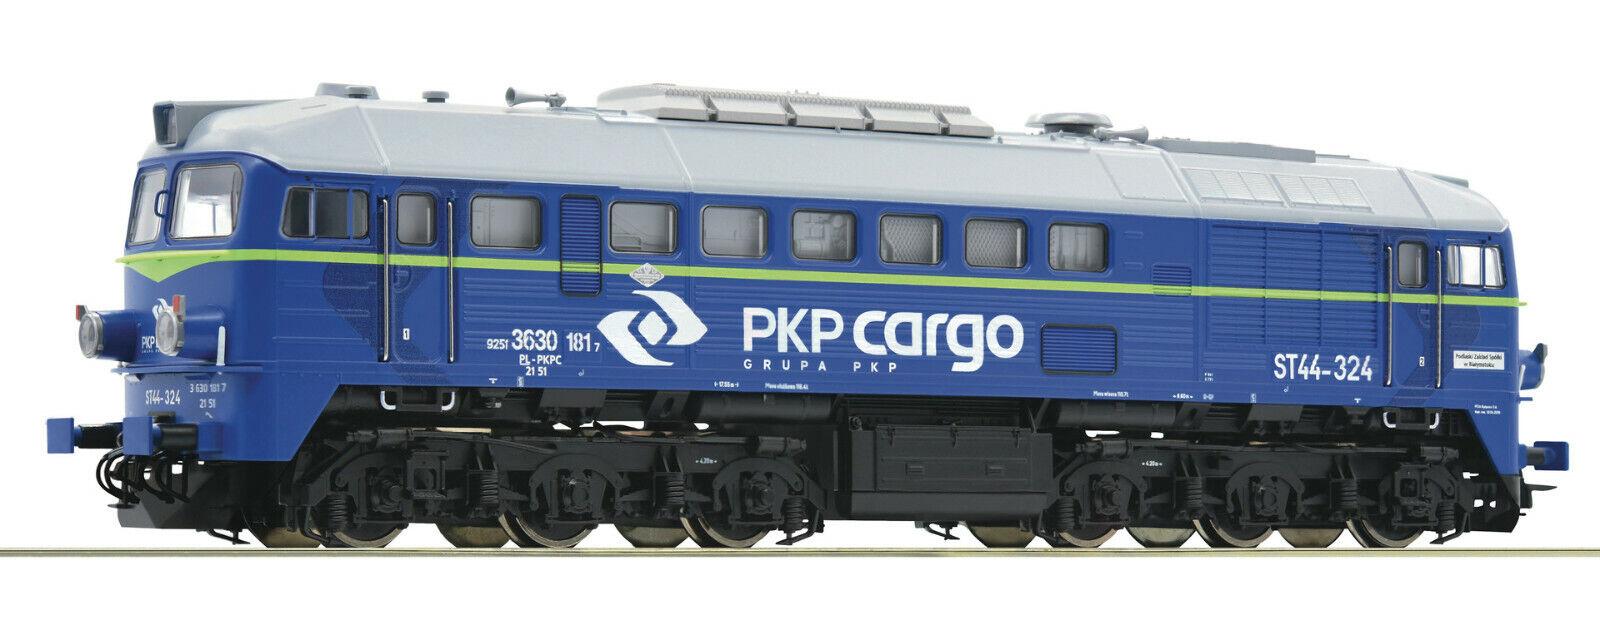 Roco ho 73779-diesel locomotora st44, PKP, digital Henning-Sound, novedad 2019